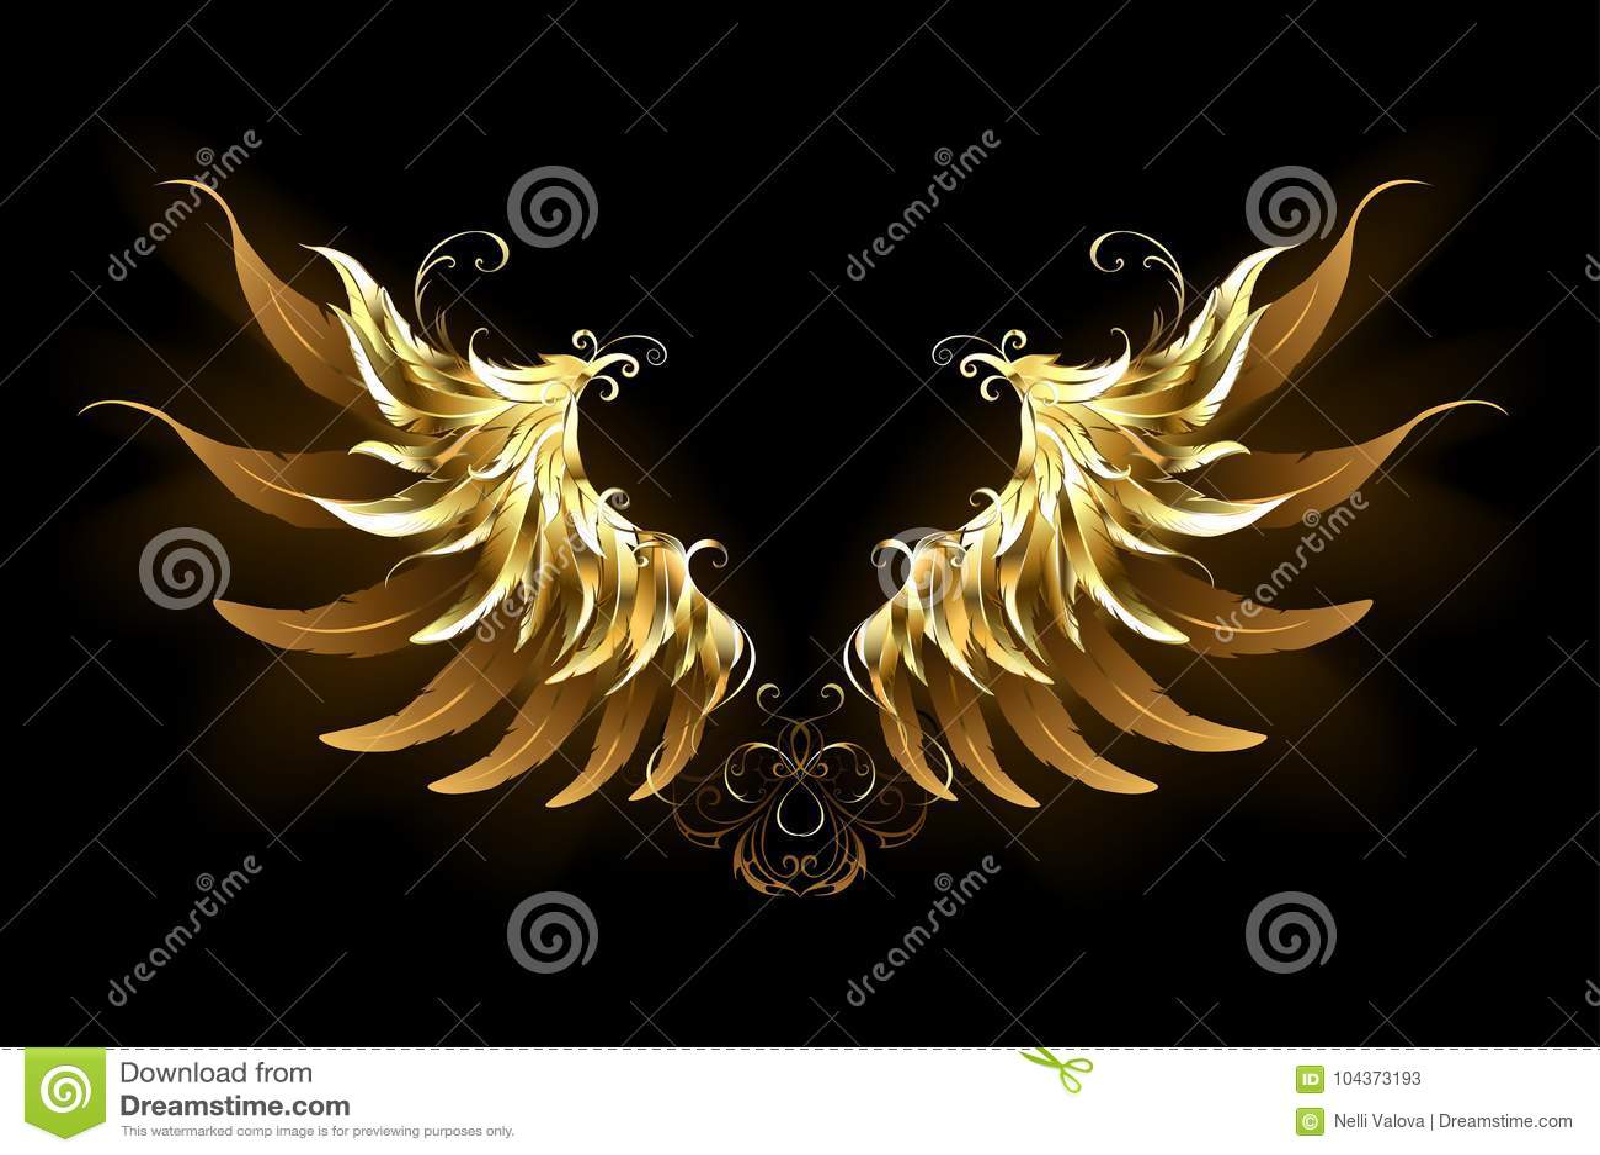 L ange brillant s envole les ailes d or